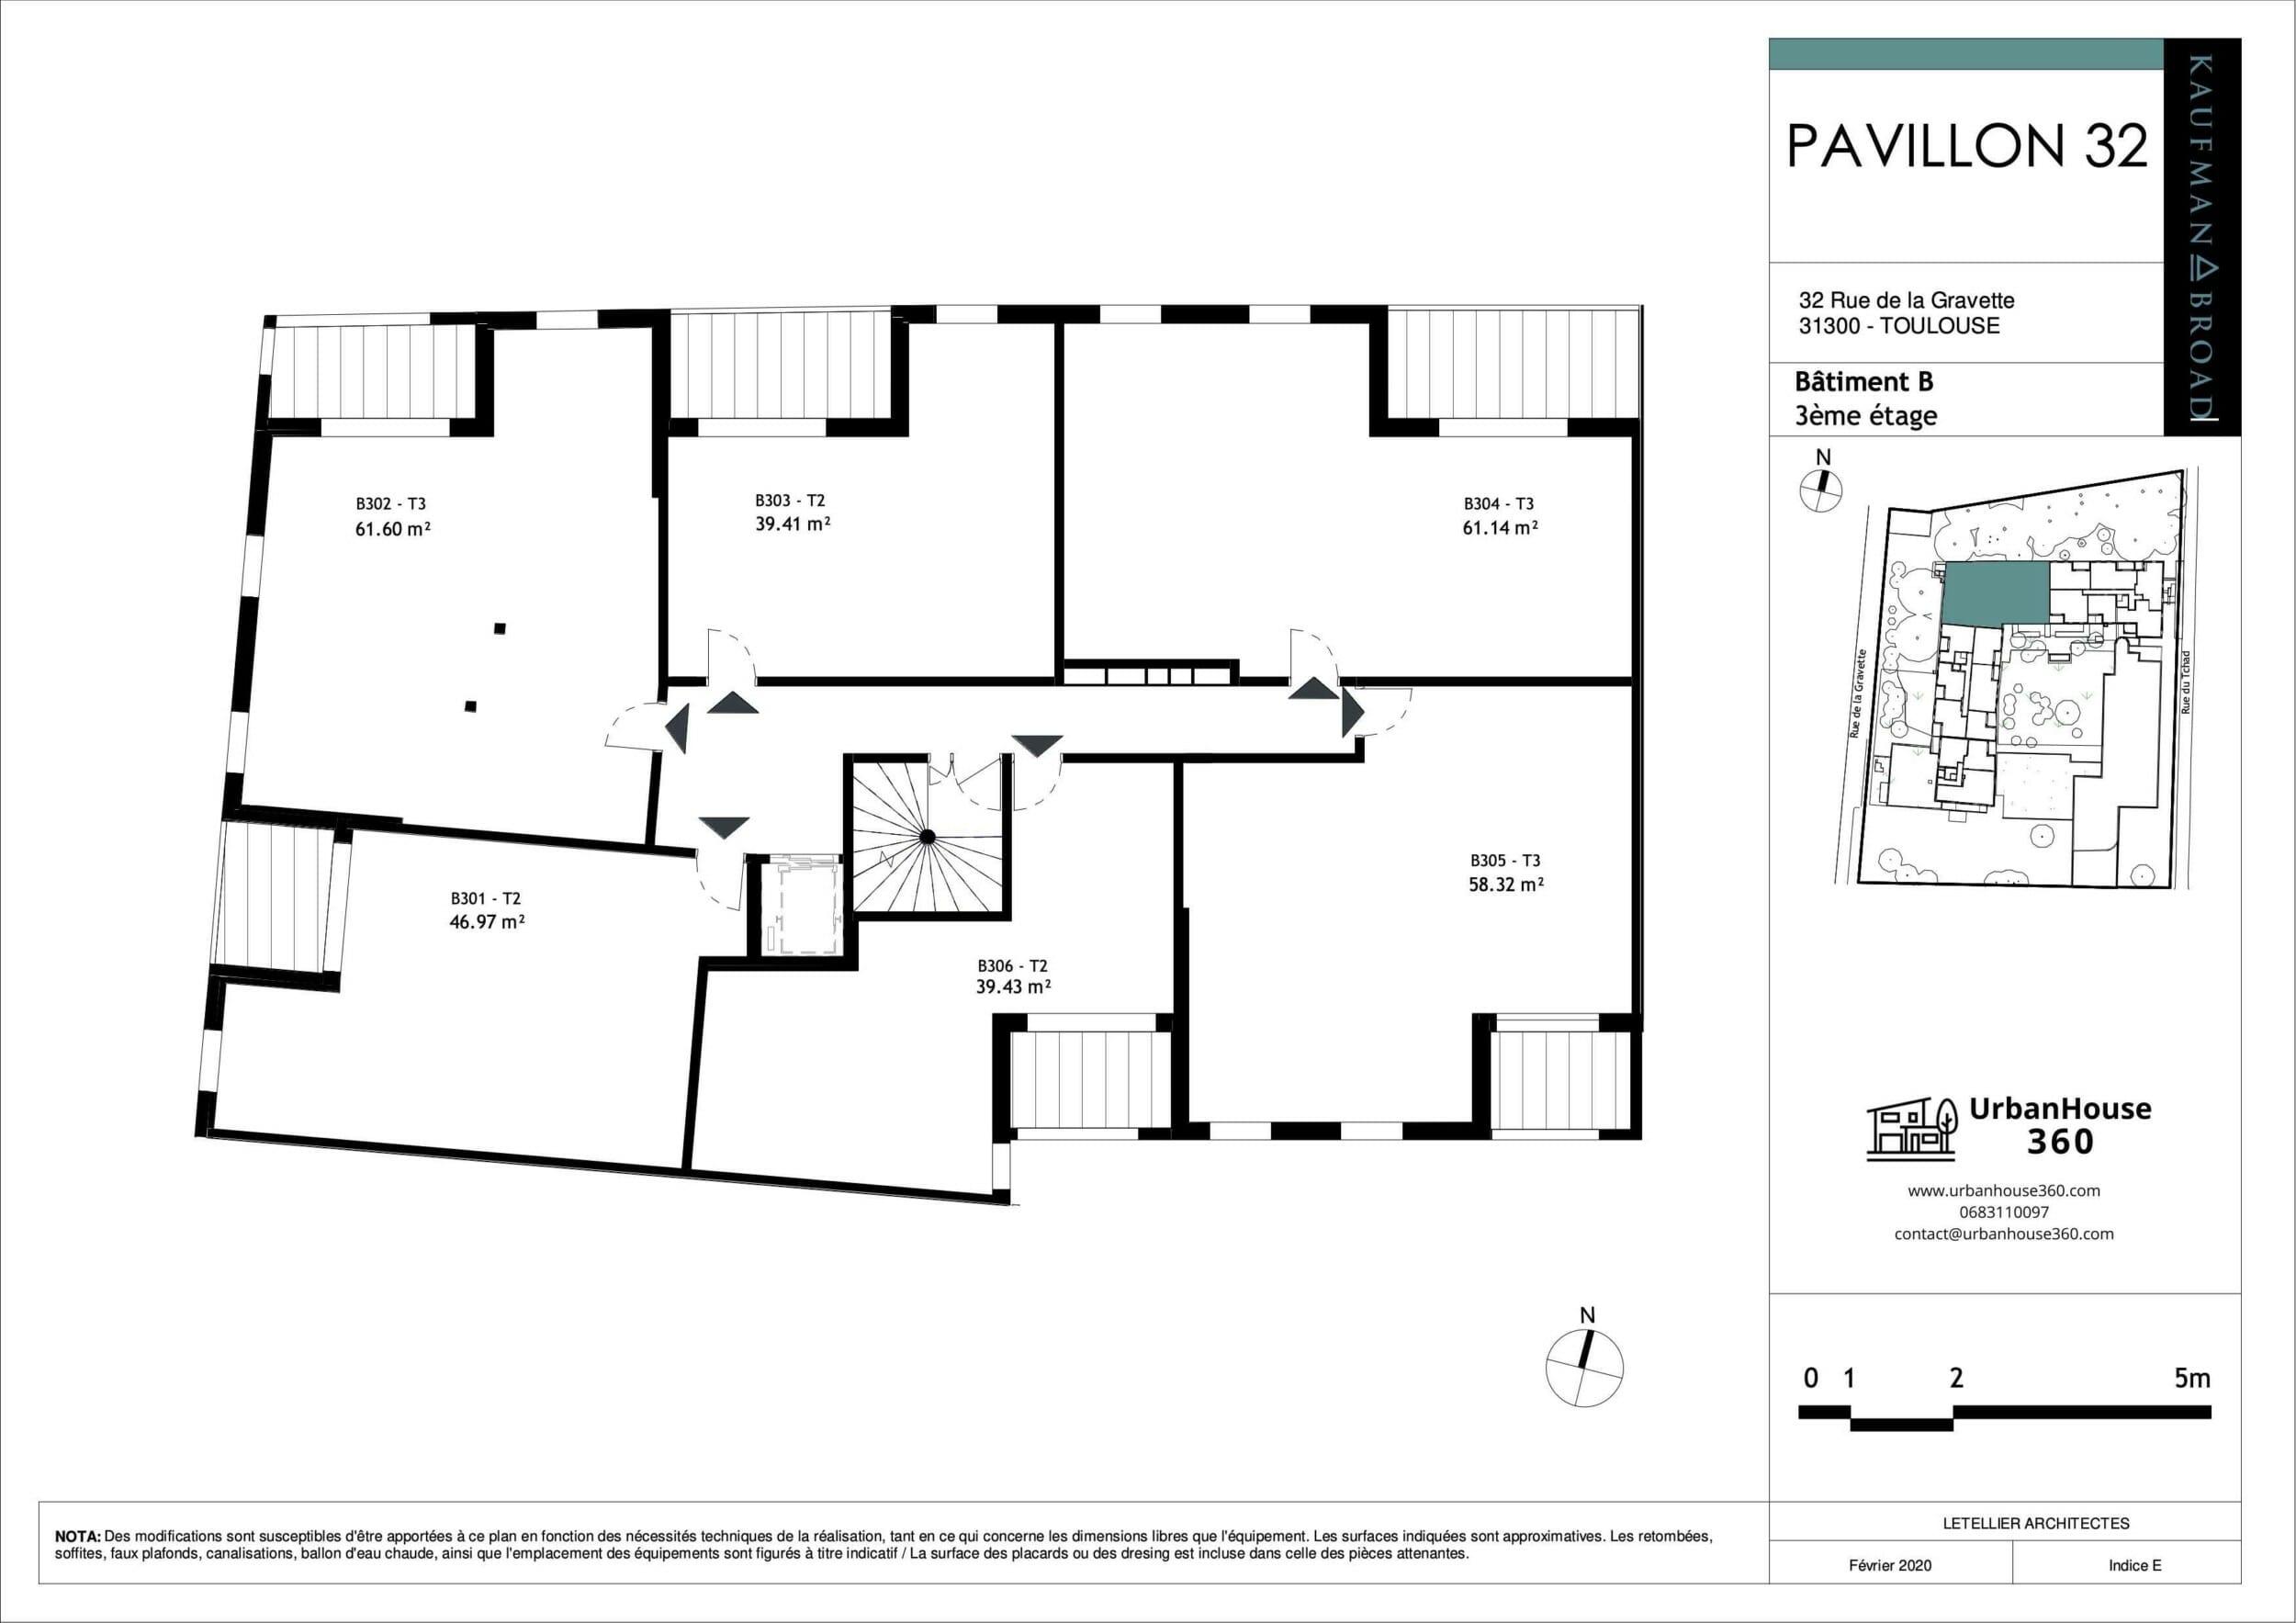 UrbanHouse360-Pavillon32-B_R+3_ind E